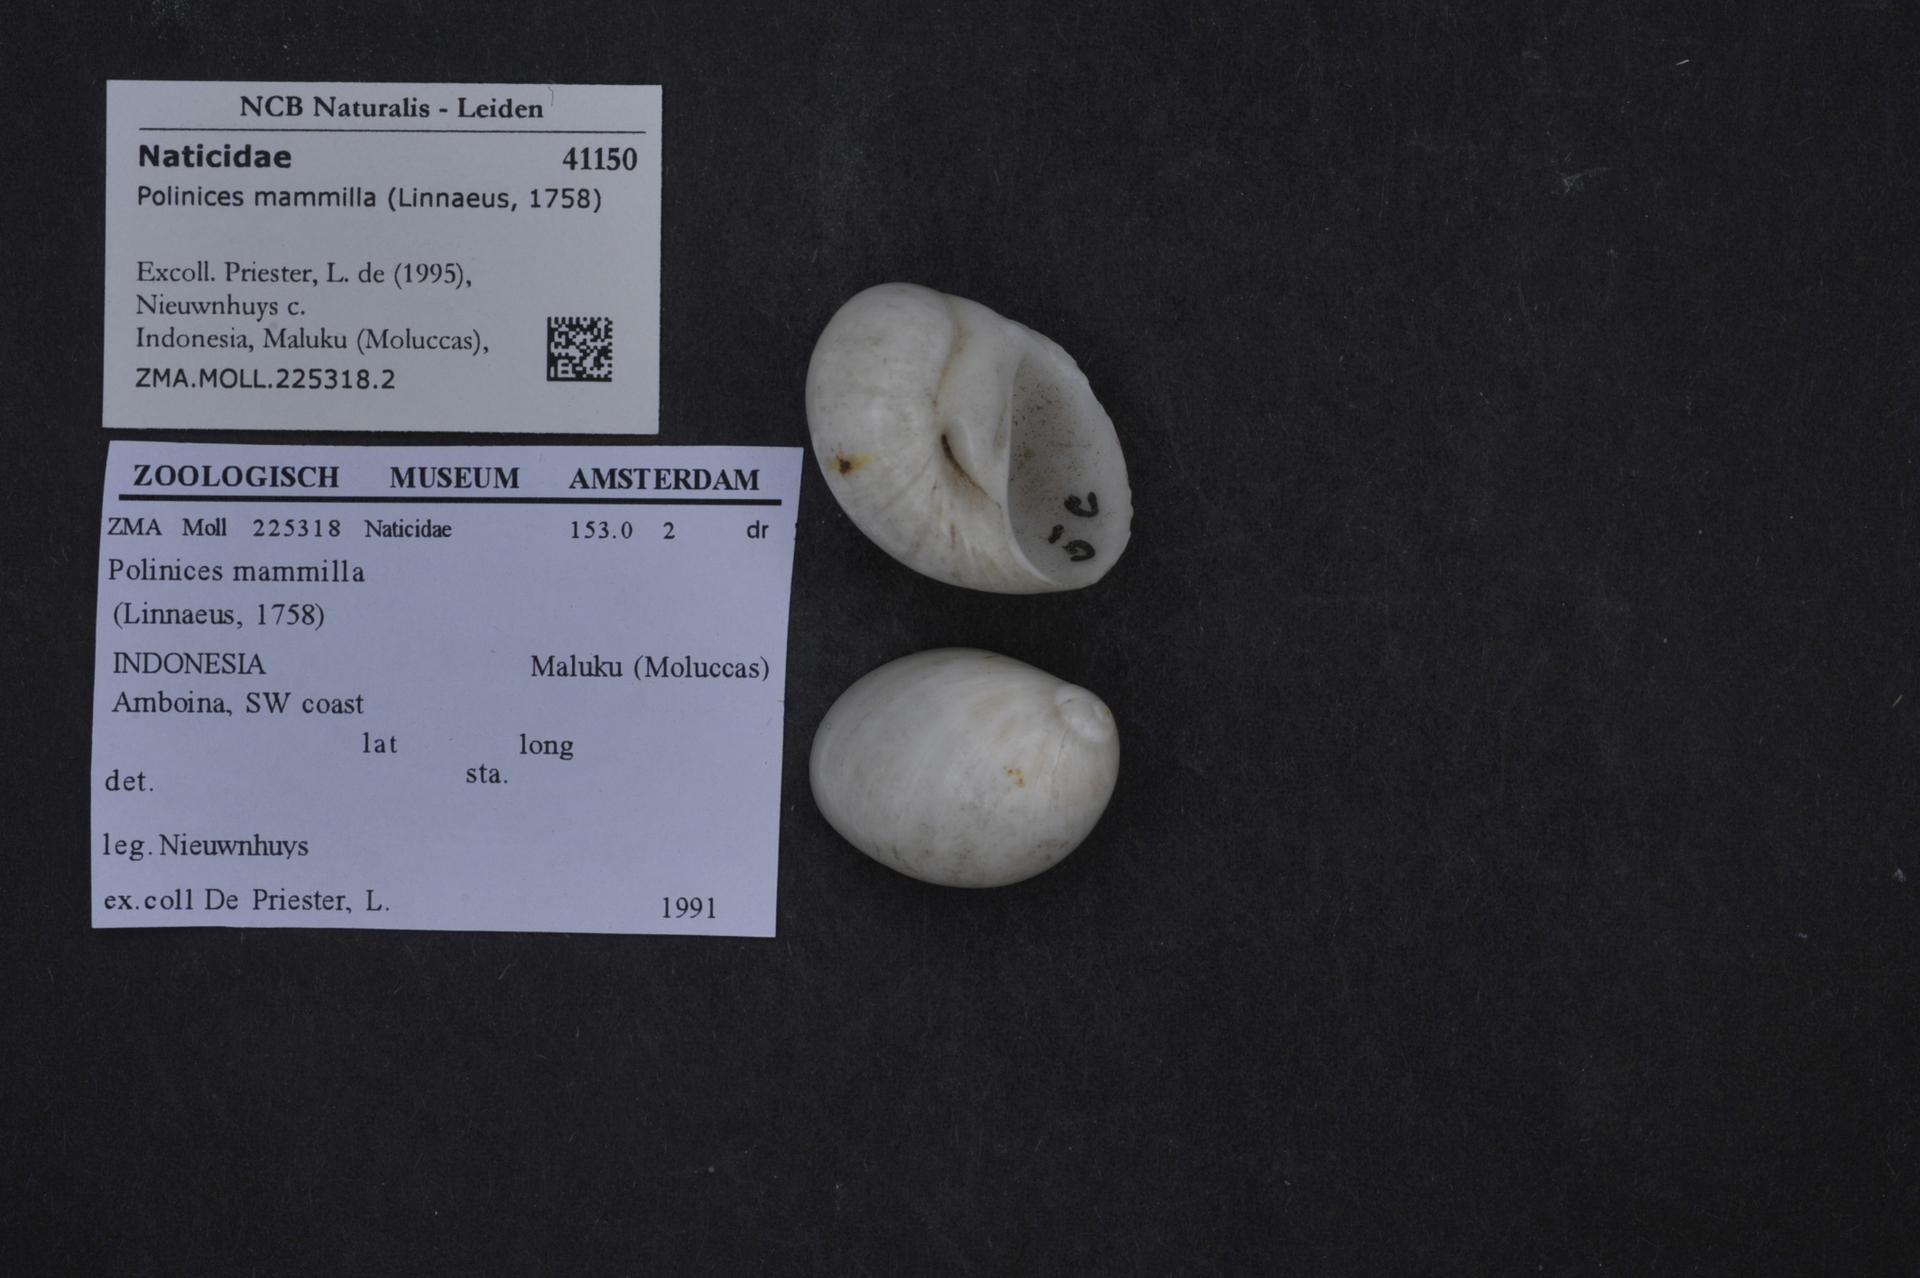 ZMA.MOLL.225318.2 | Polinices mammilla (Linnaeus, 1758)